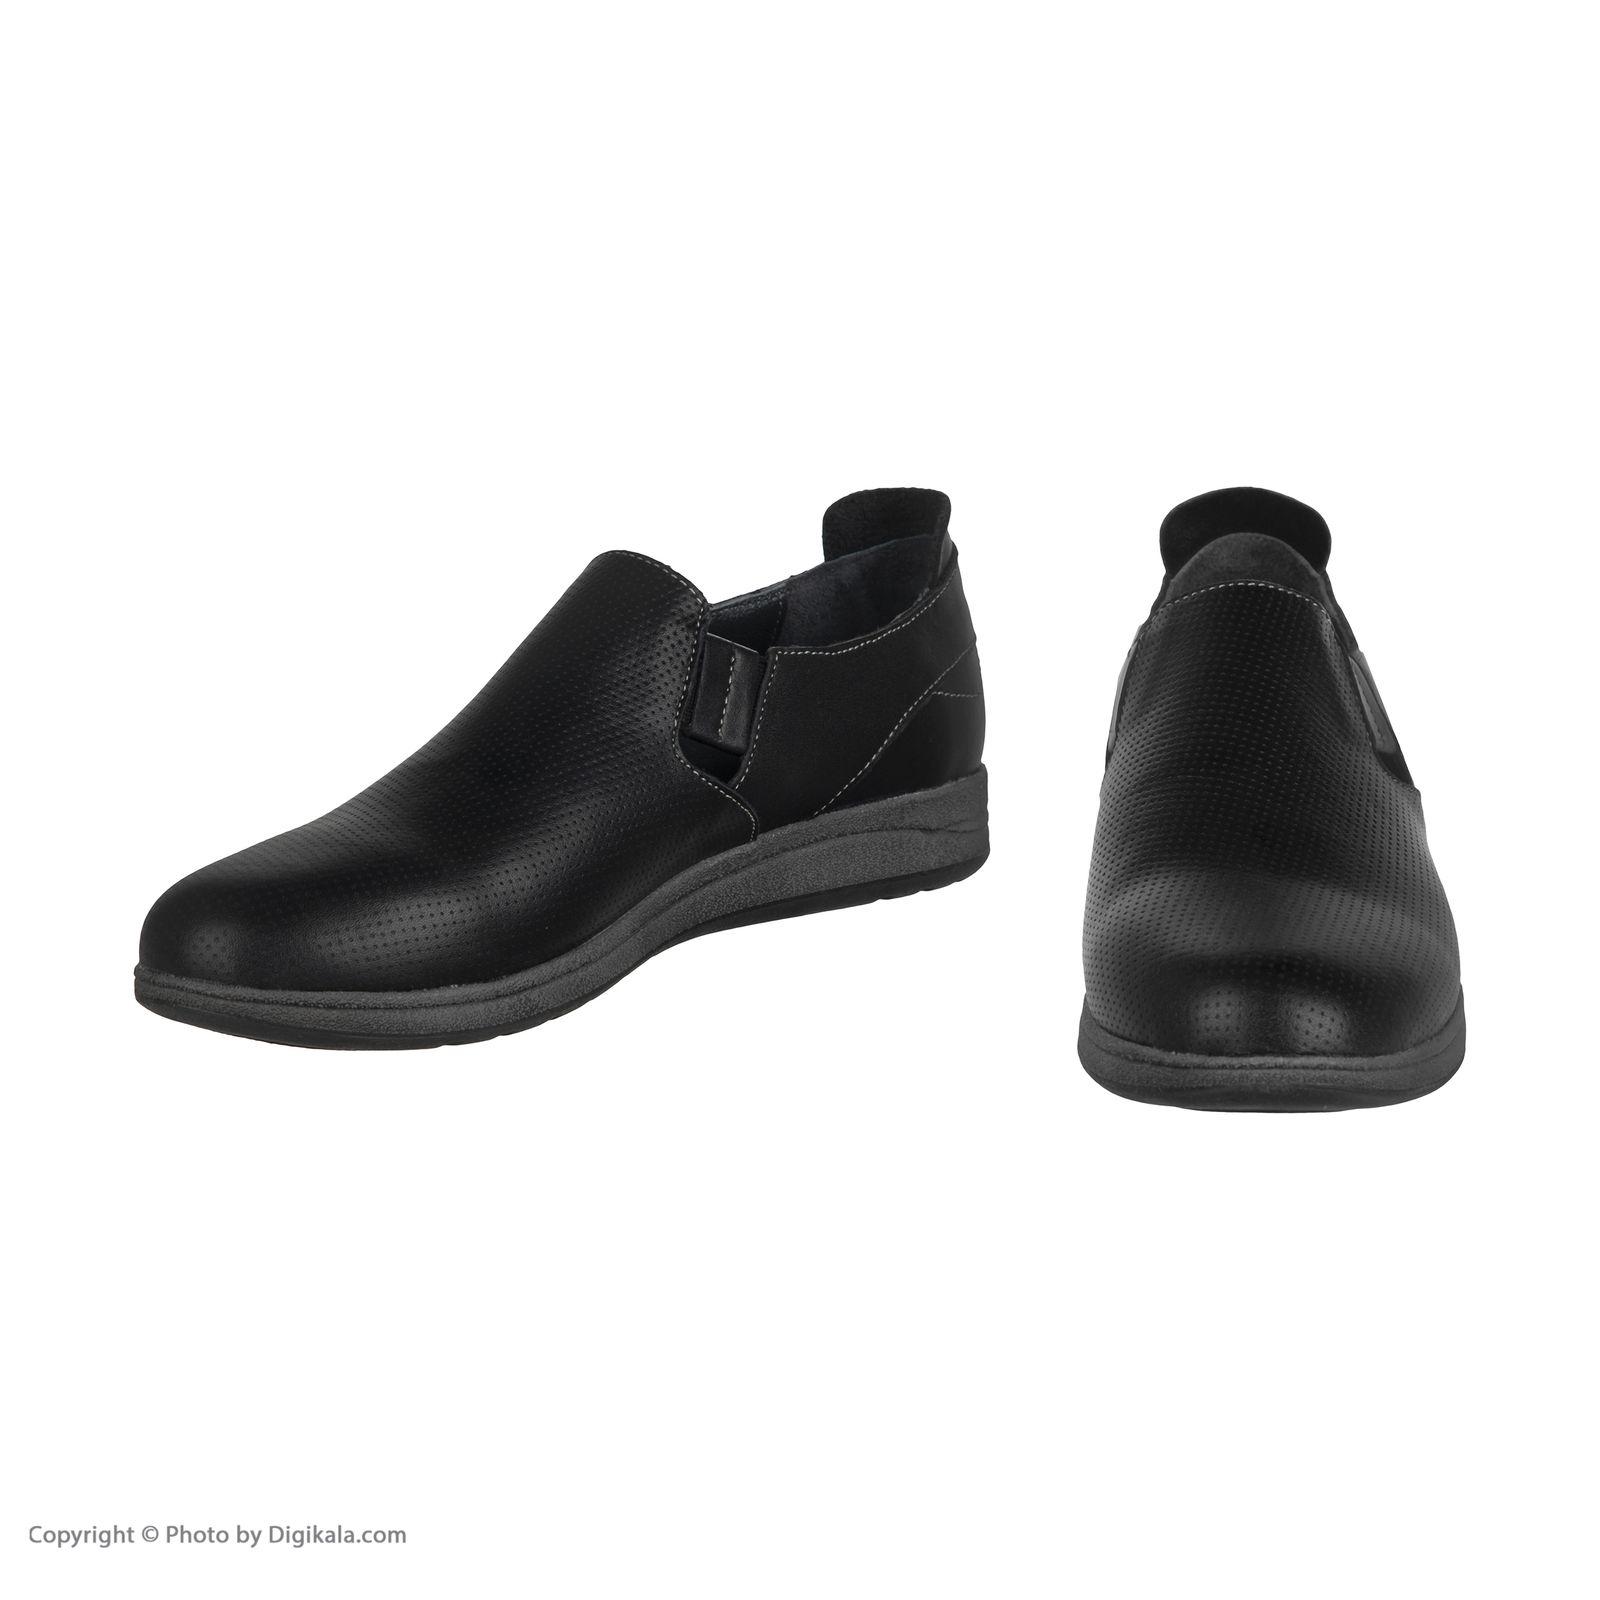 کفش روزمره زنانه سوته مدل 2958D500101 -  - 6